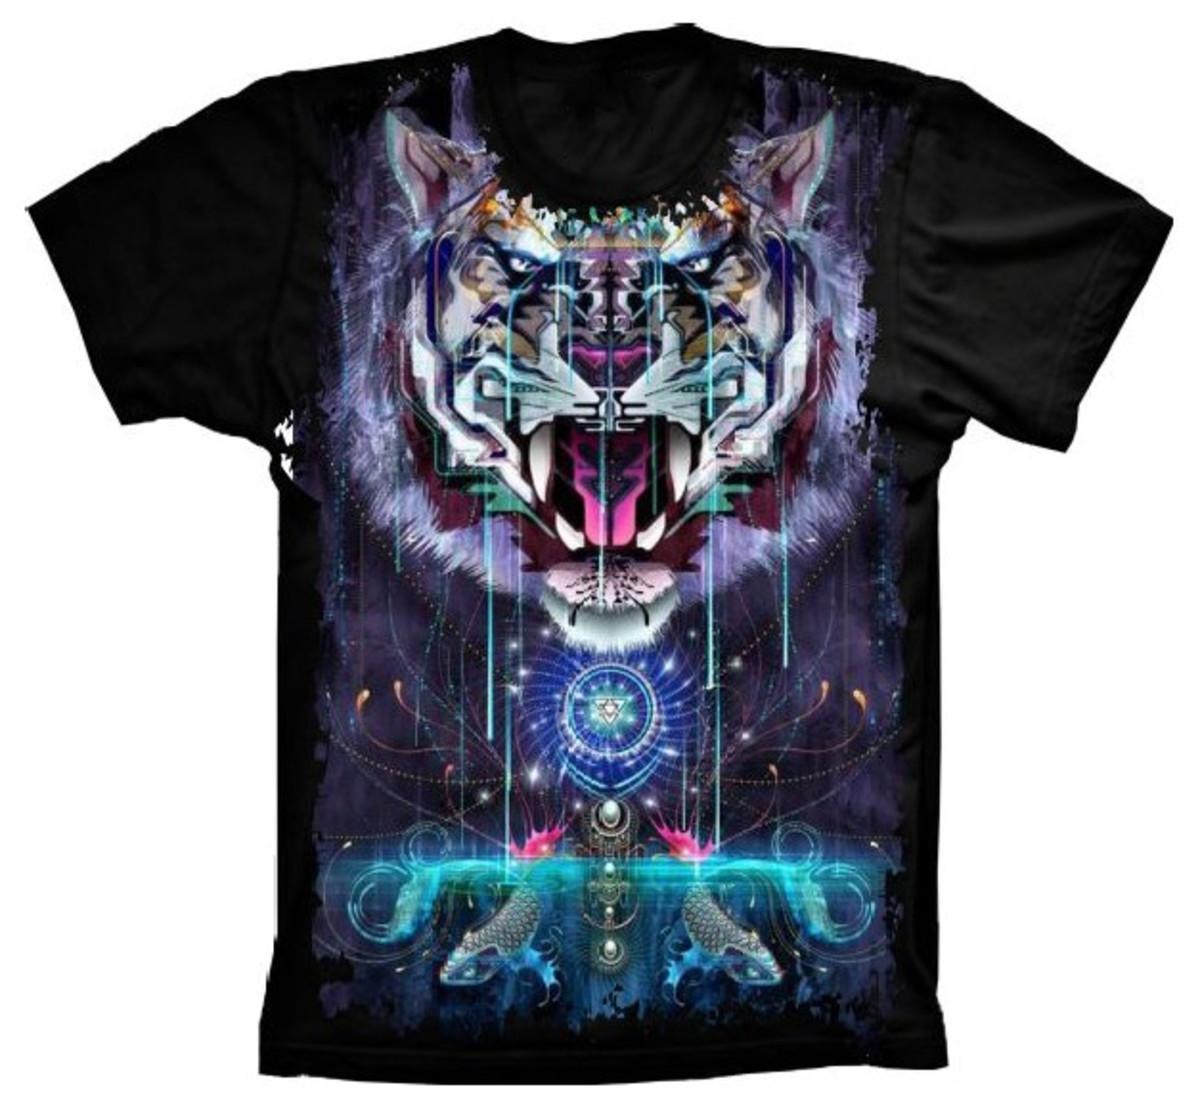 165b89881d0f2 Camiseta Tigre no Elo7 | Estampas Criativas (EA4691)